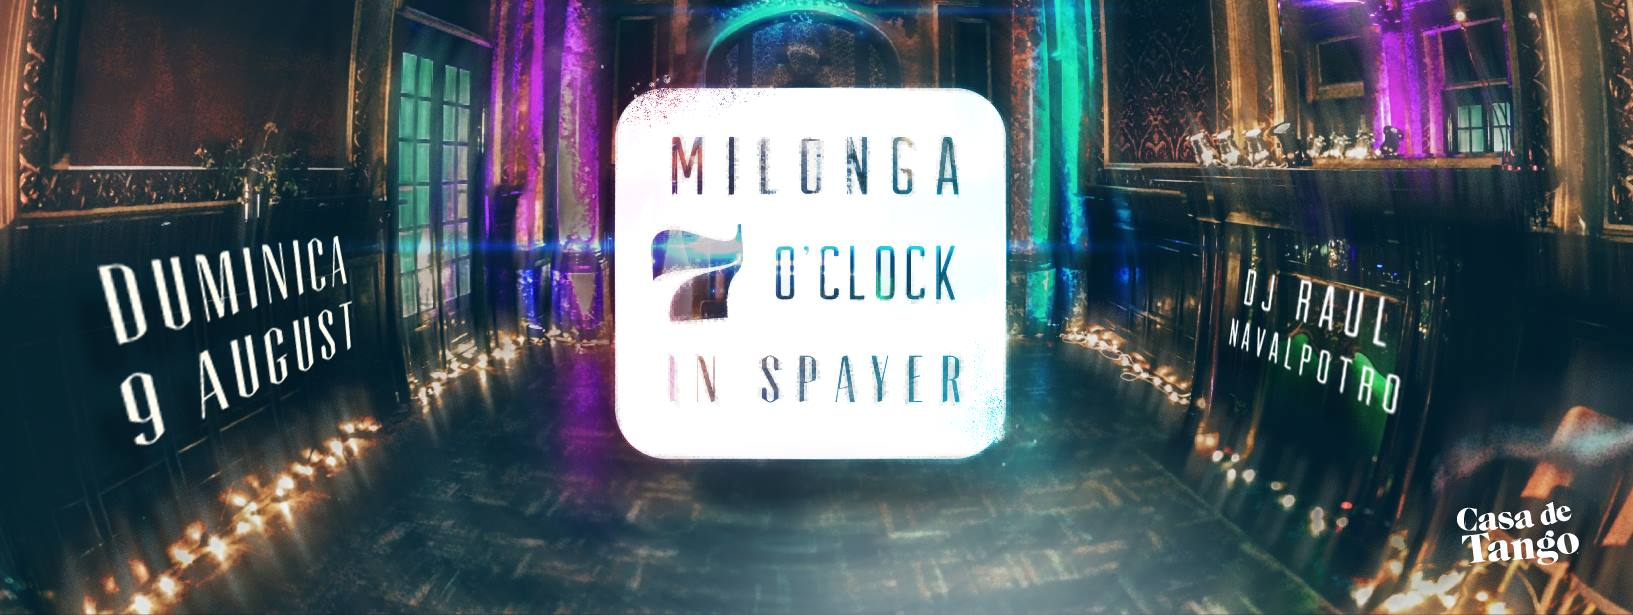 Flyer Milonga 7